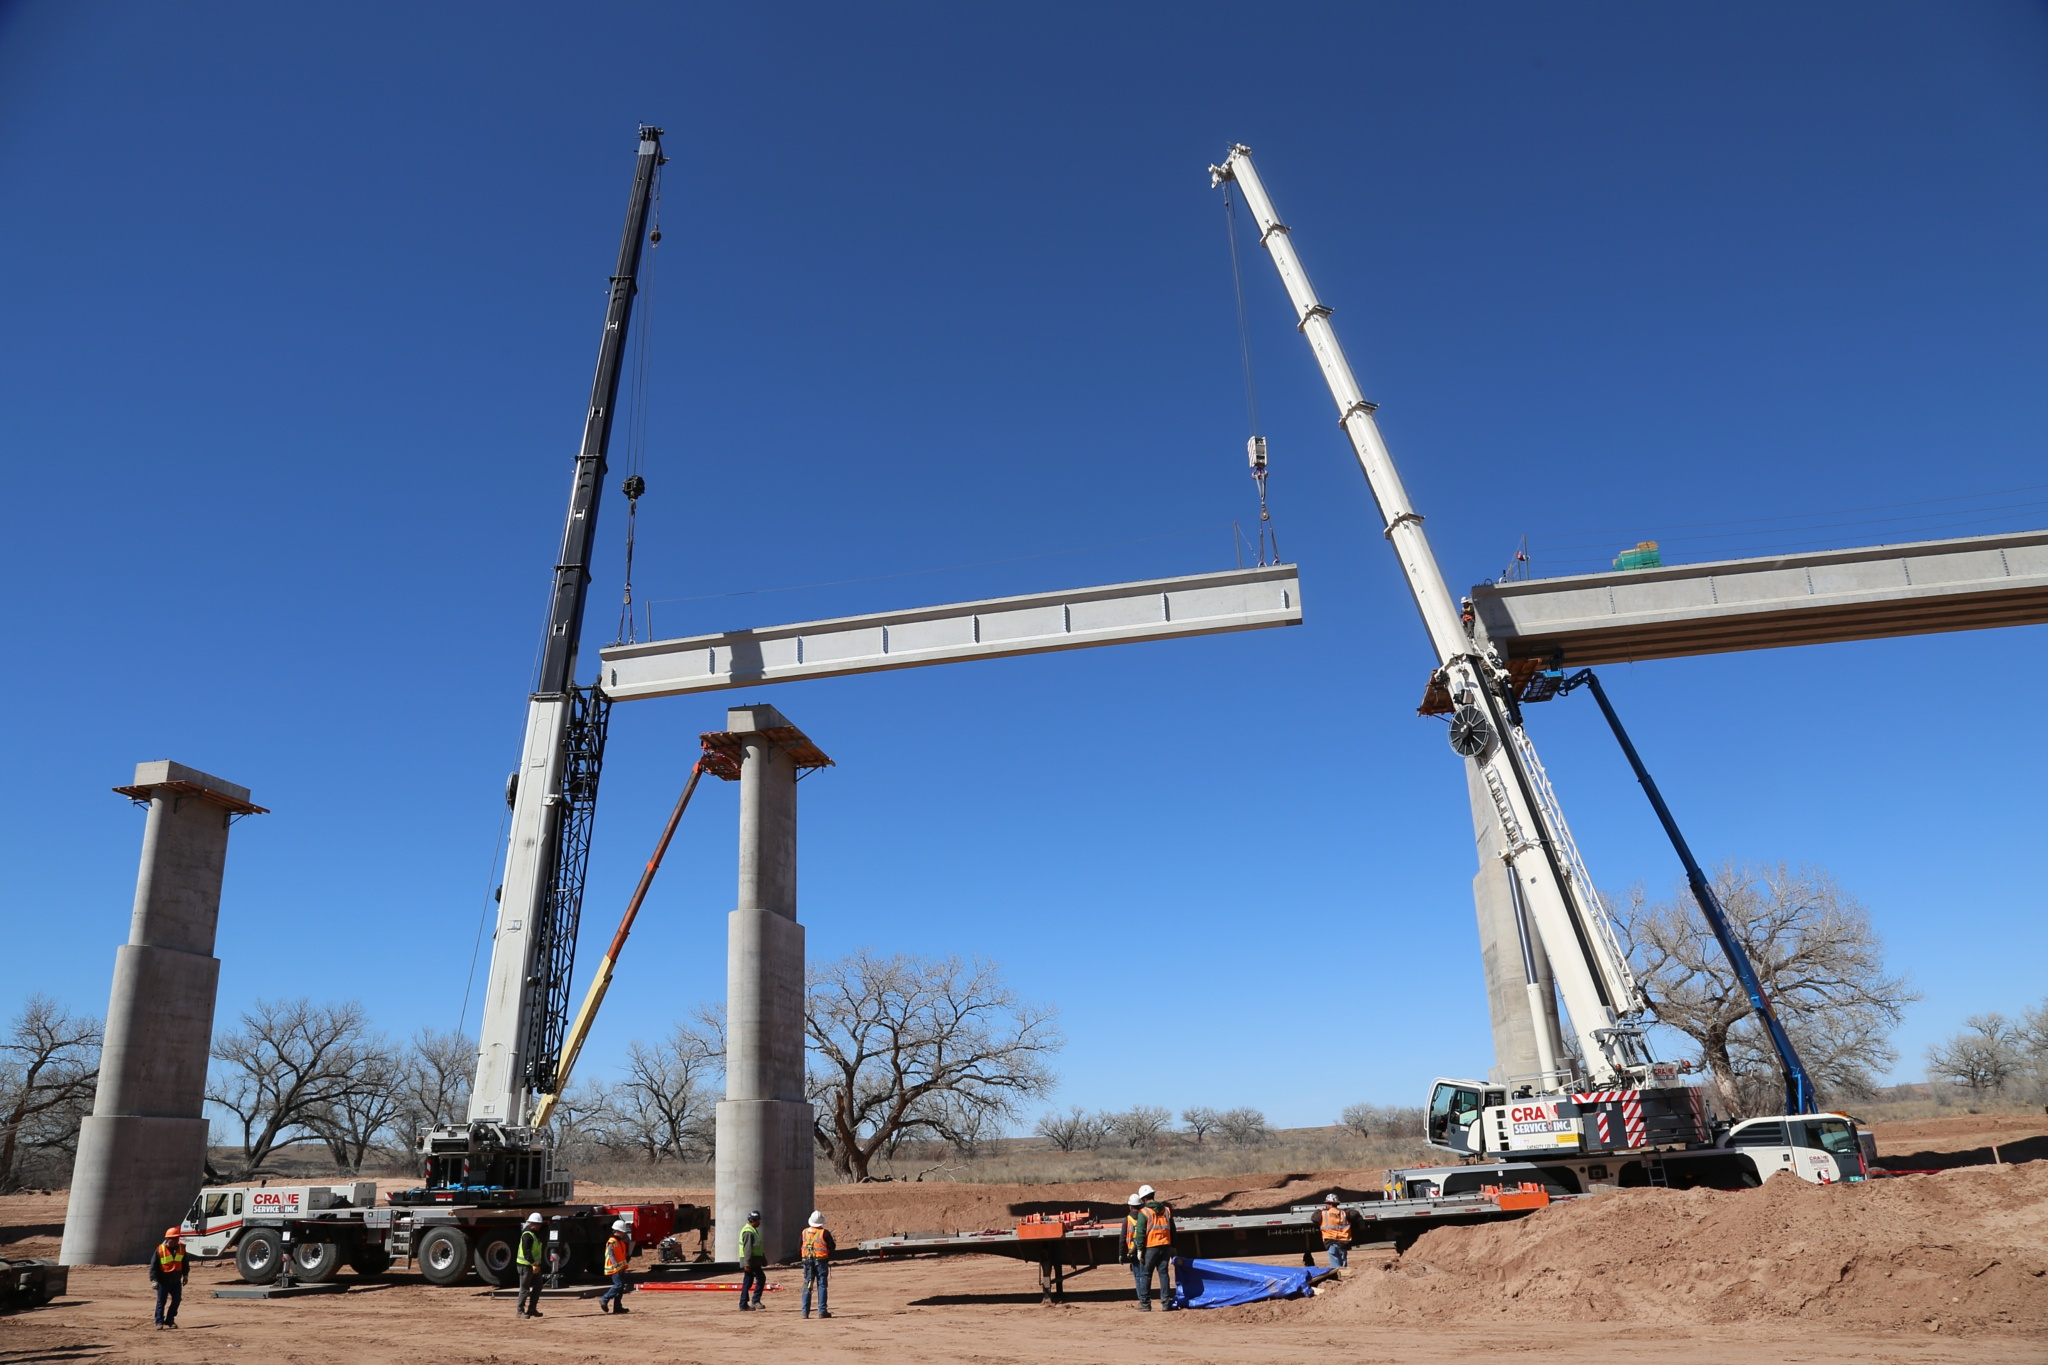 Hoisting Bridge Beams in Fort Sumner by Chris Martin